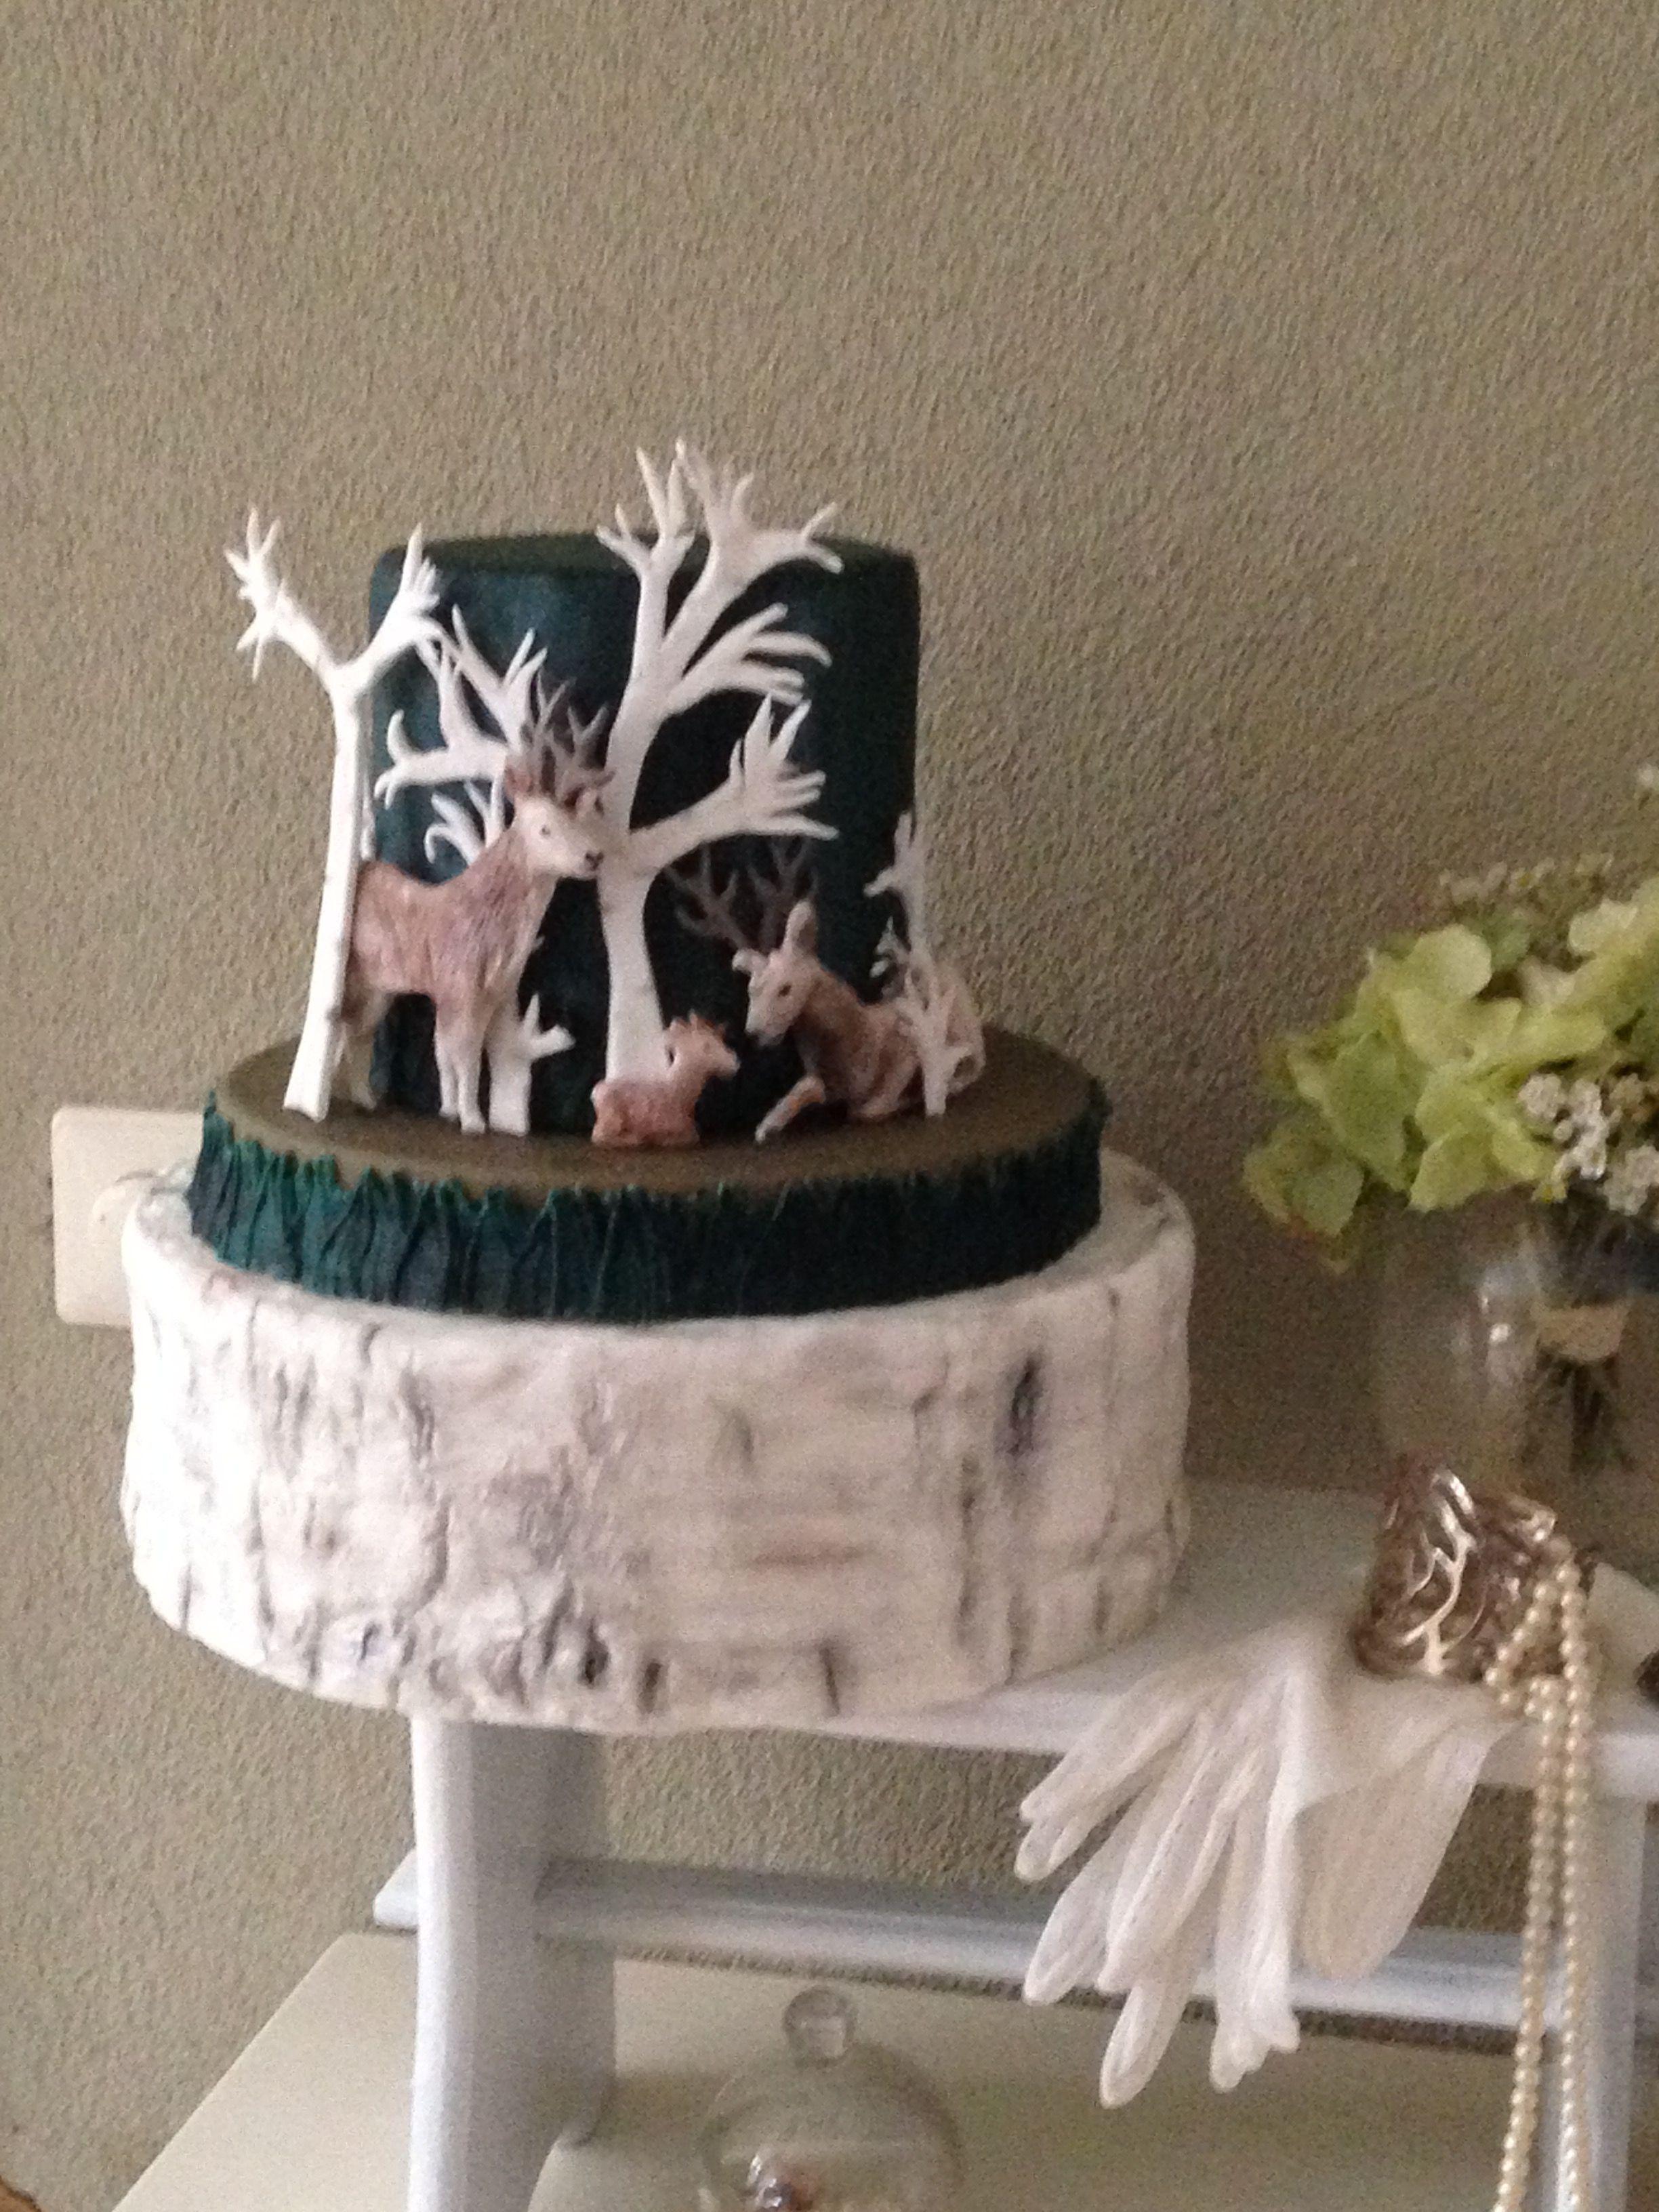 Rendier cake